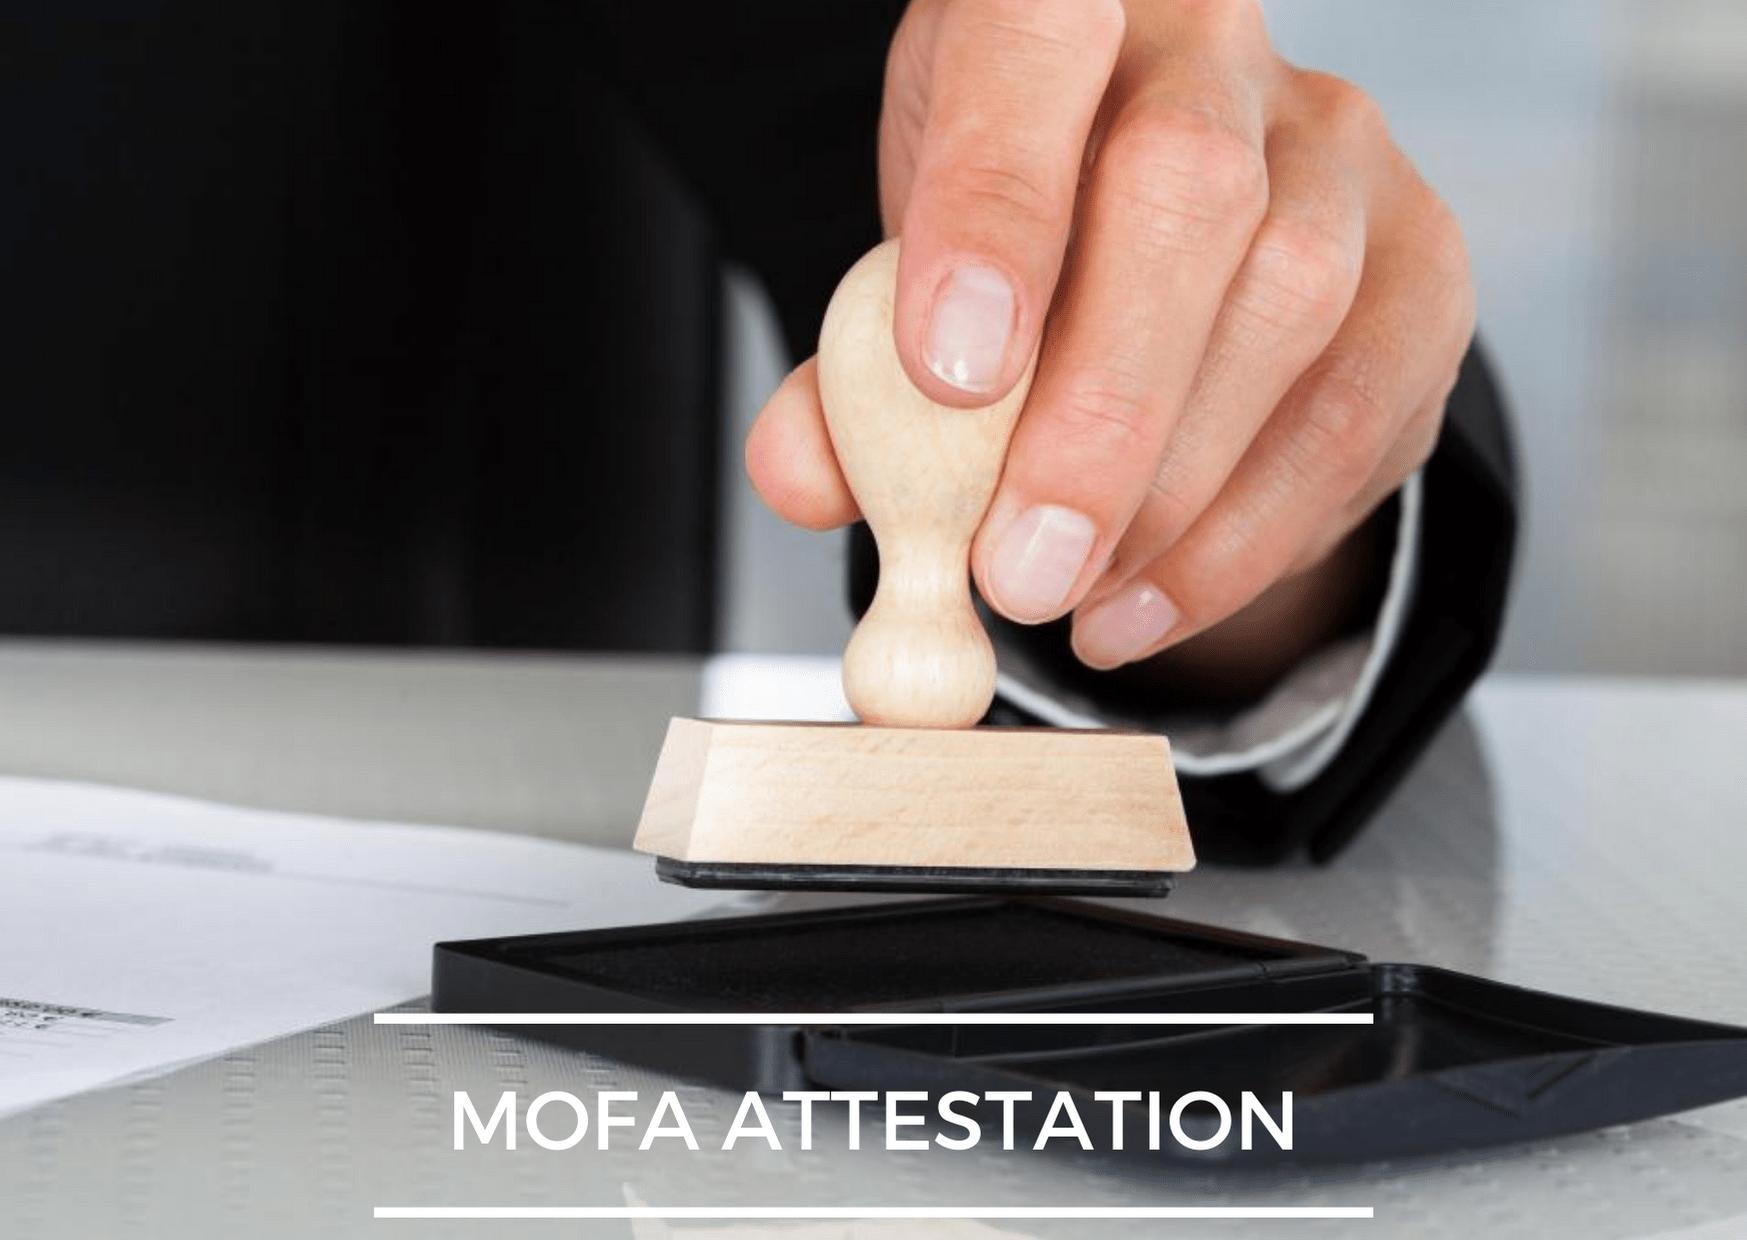 mofa attestation